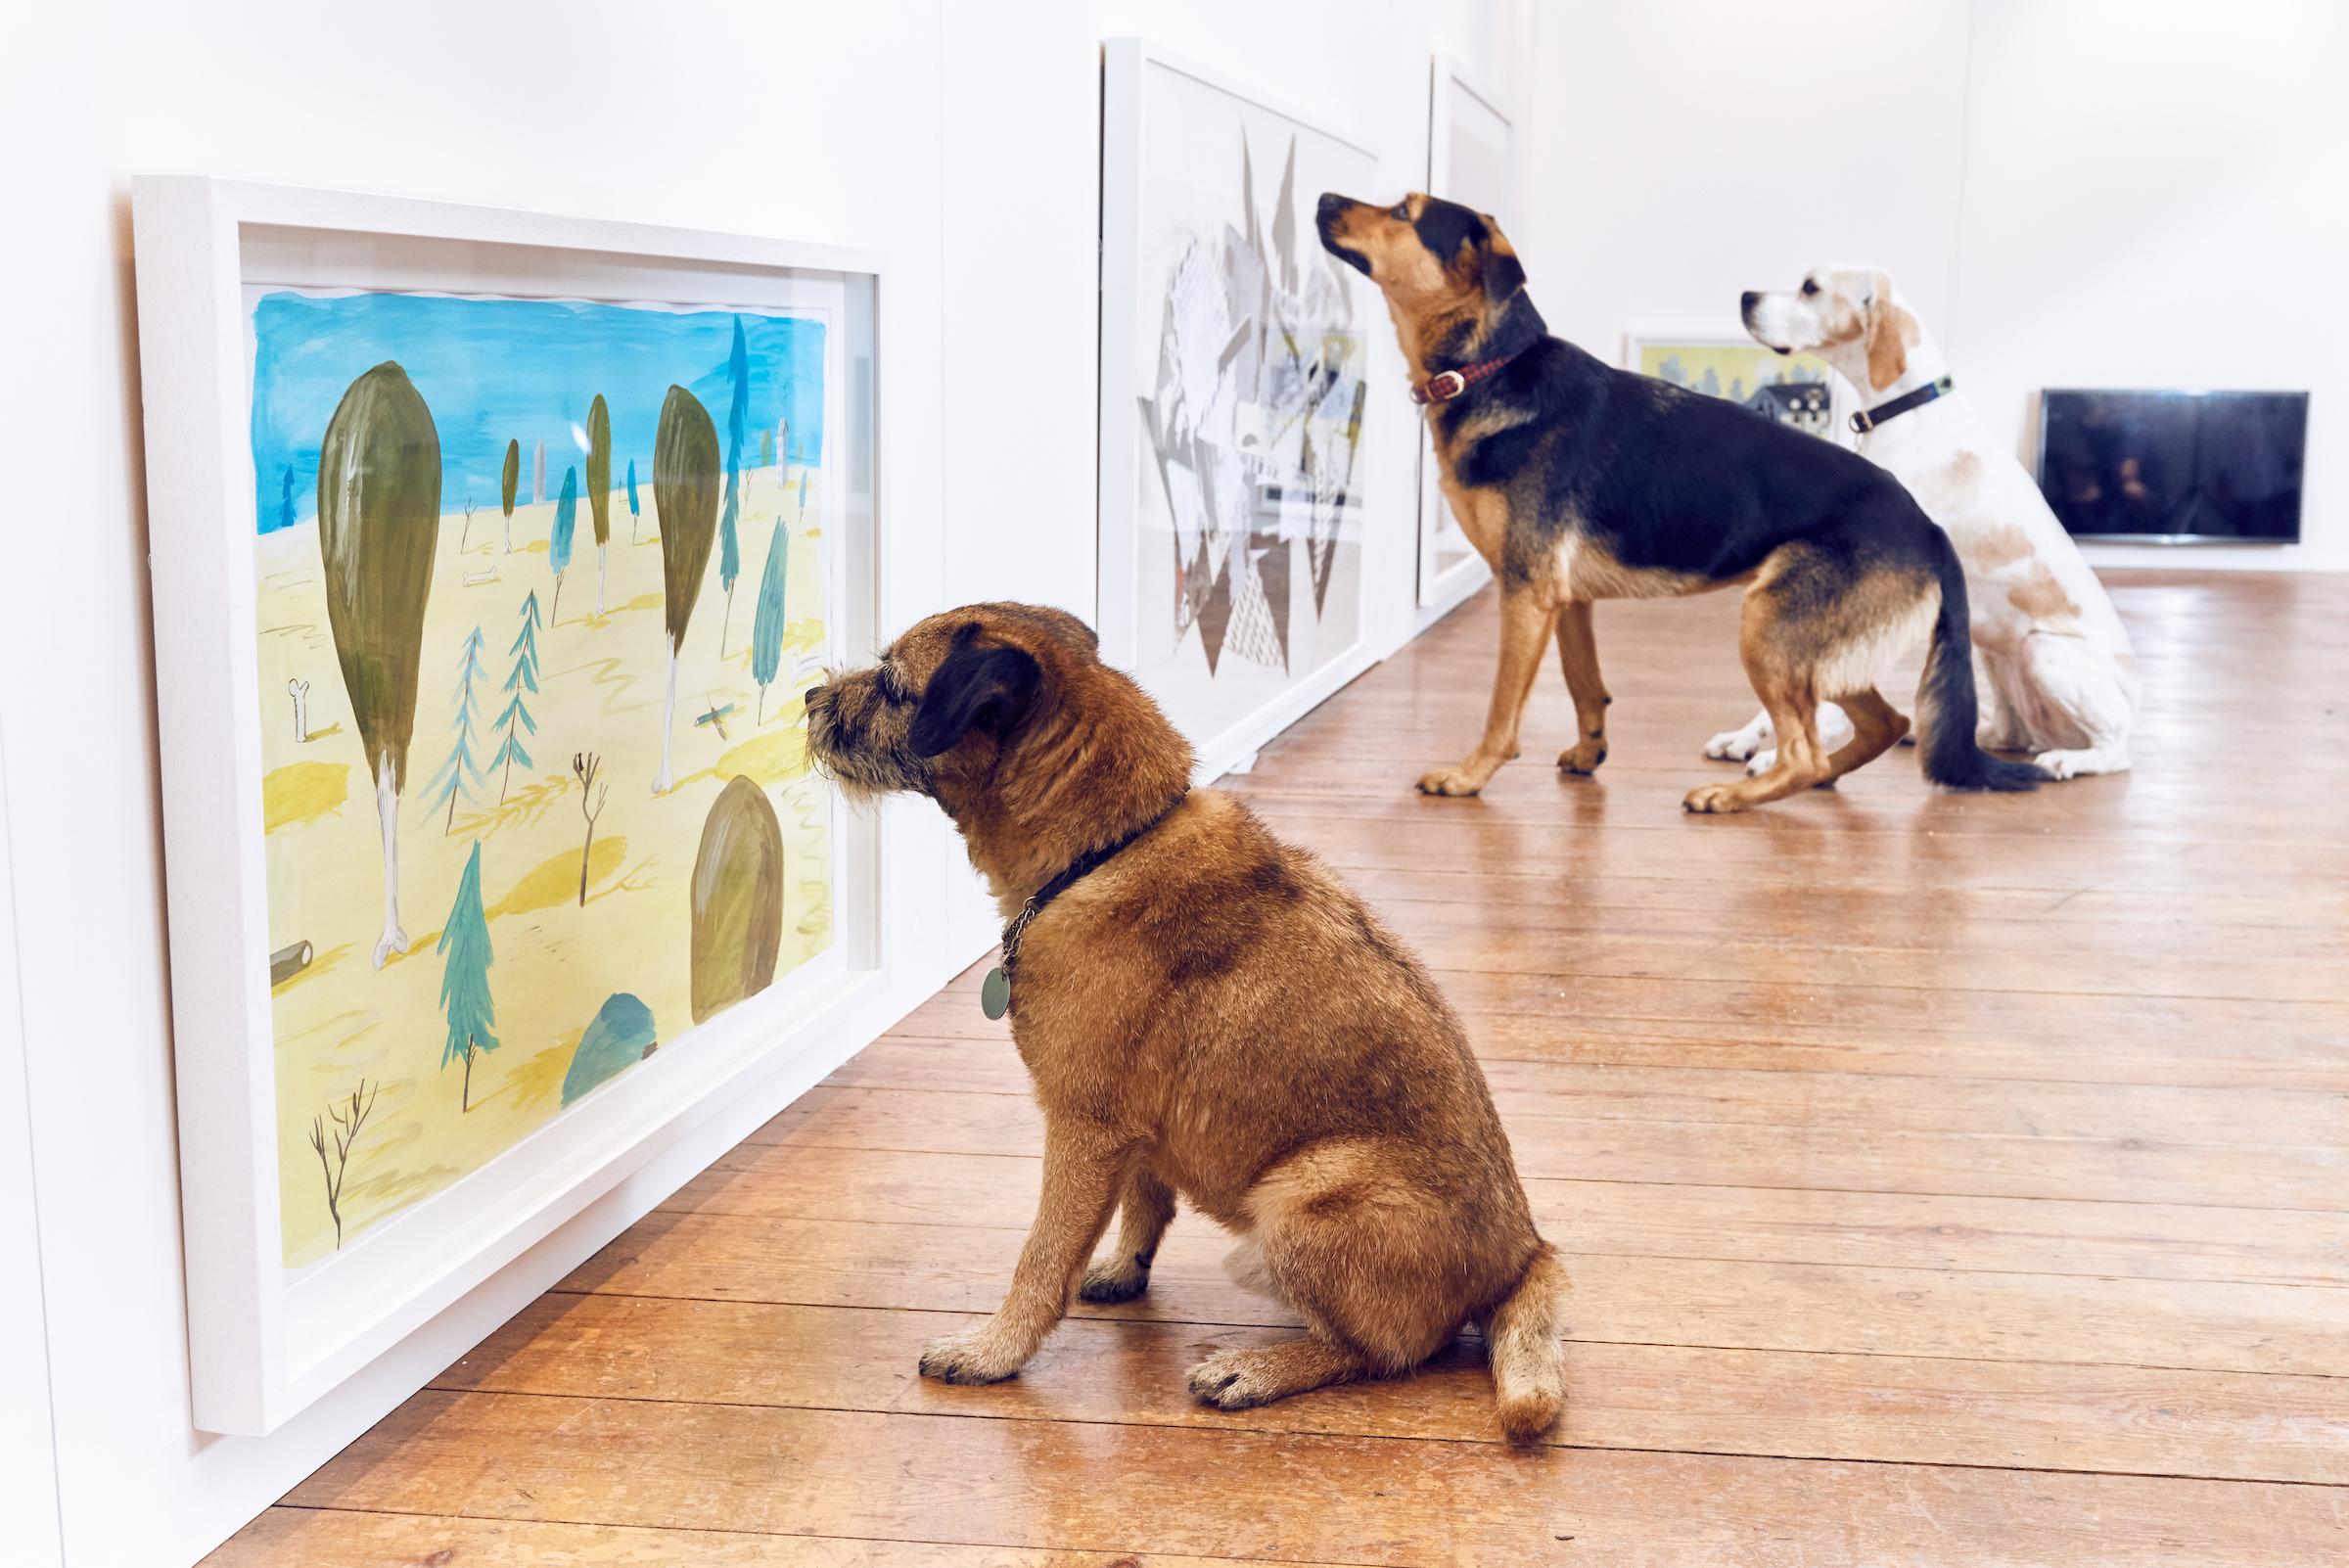 BUCK_Dogs_Exhibition-1.jpg